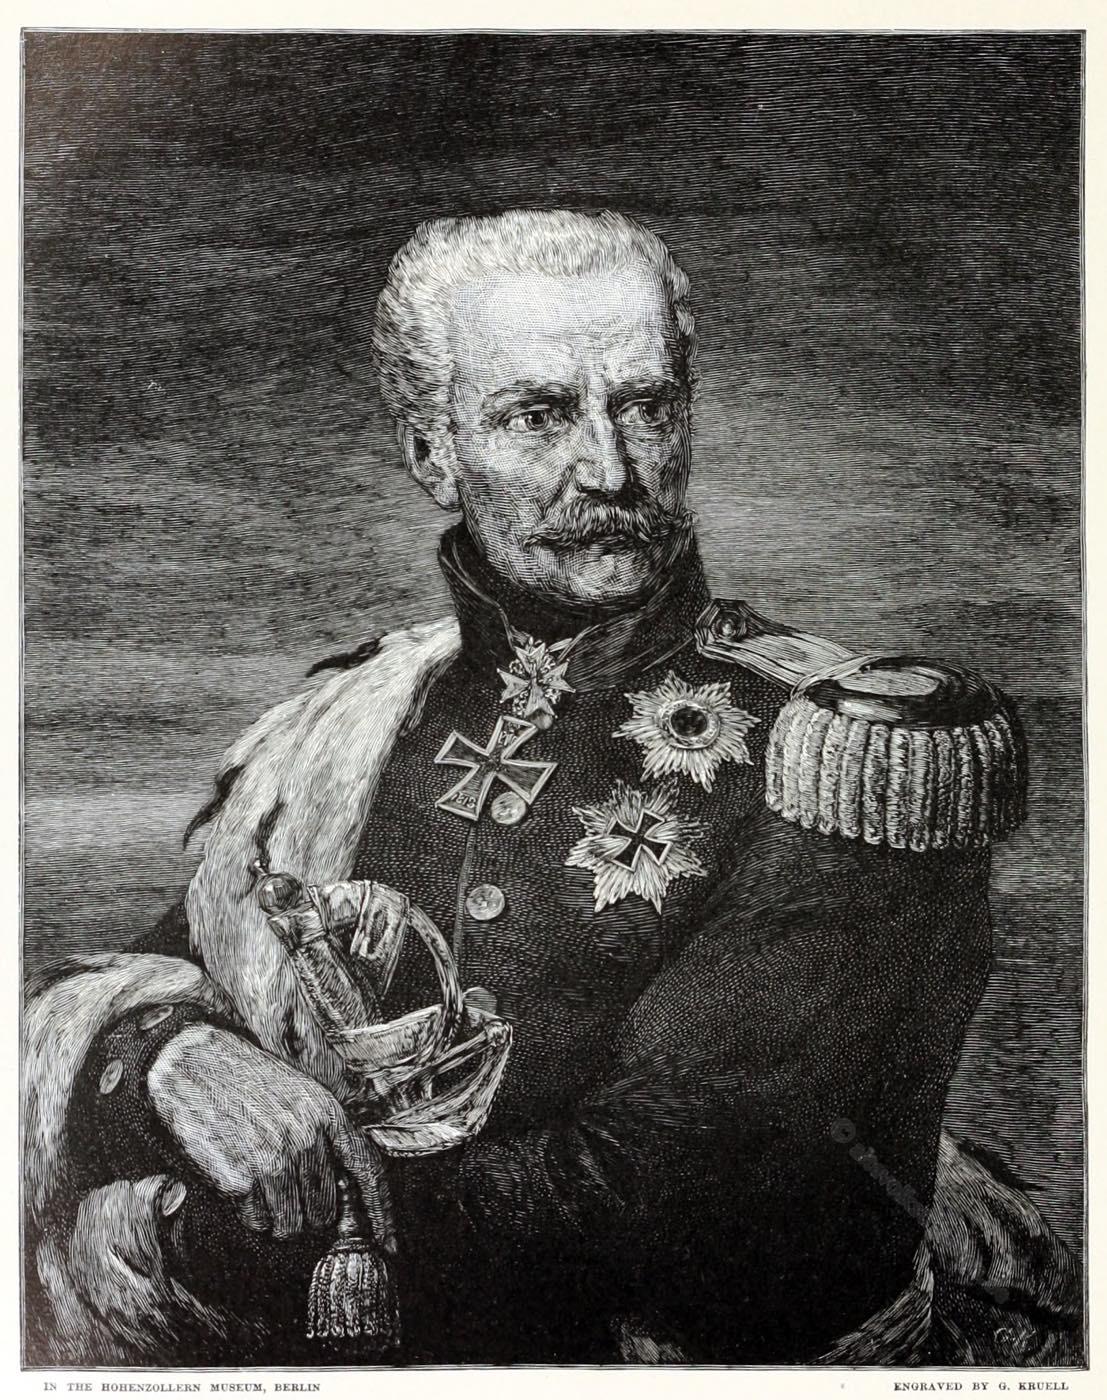 Gebhard Leberecht, Blücher, Befreiungskriege,